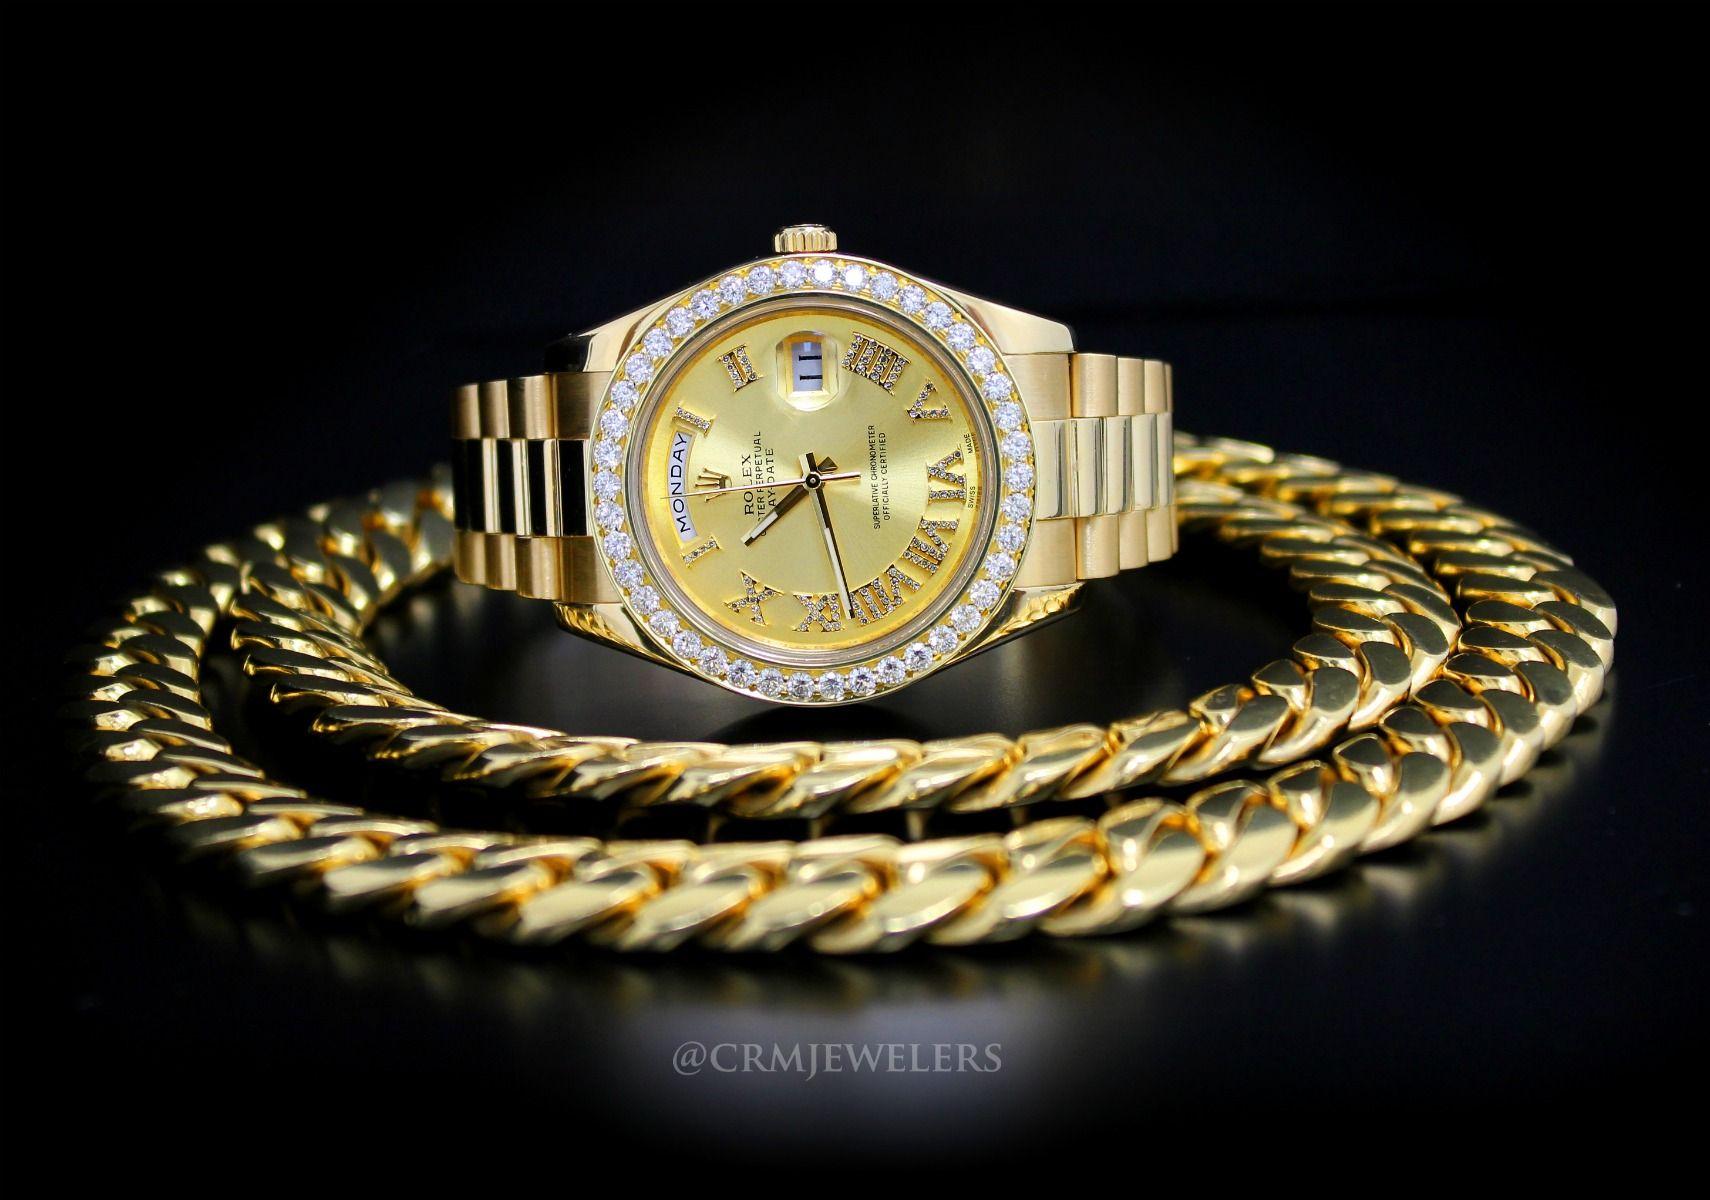 Miami Cuban Link Chains And Bracelets Crm Jewelers Miami Fl Gold Chains For Men Chains For Men Miami Cuban Link Chain